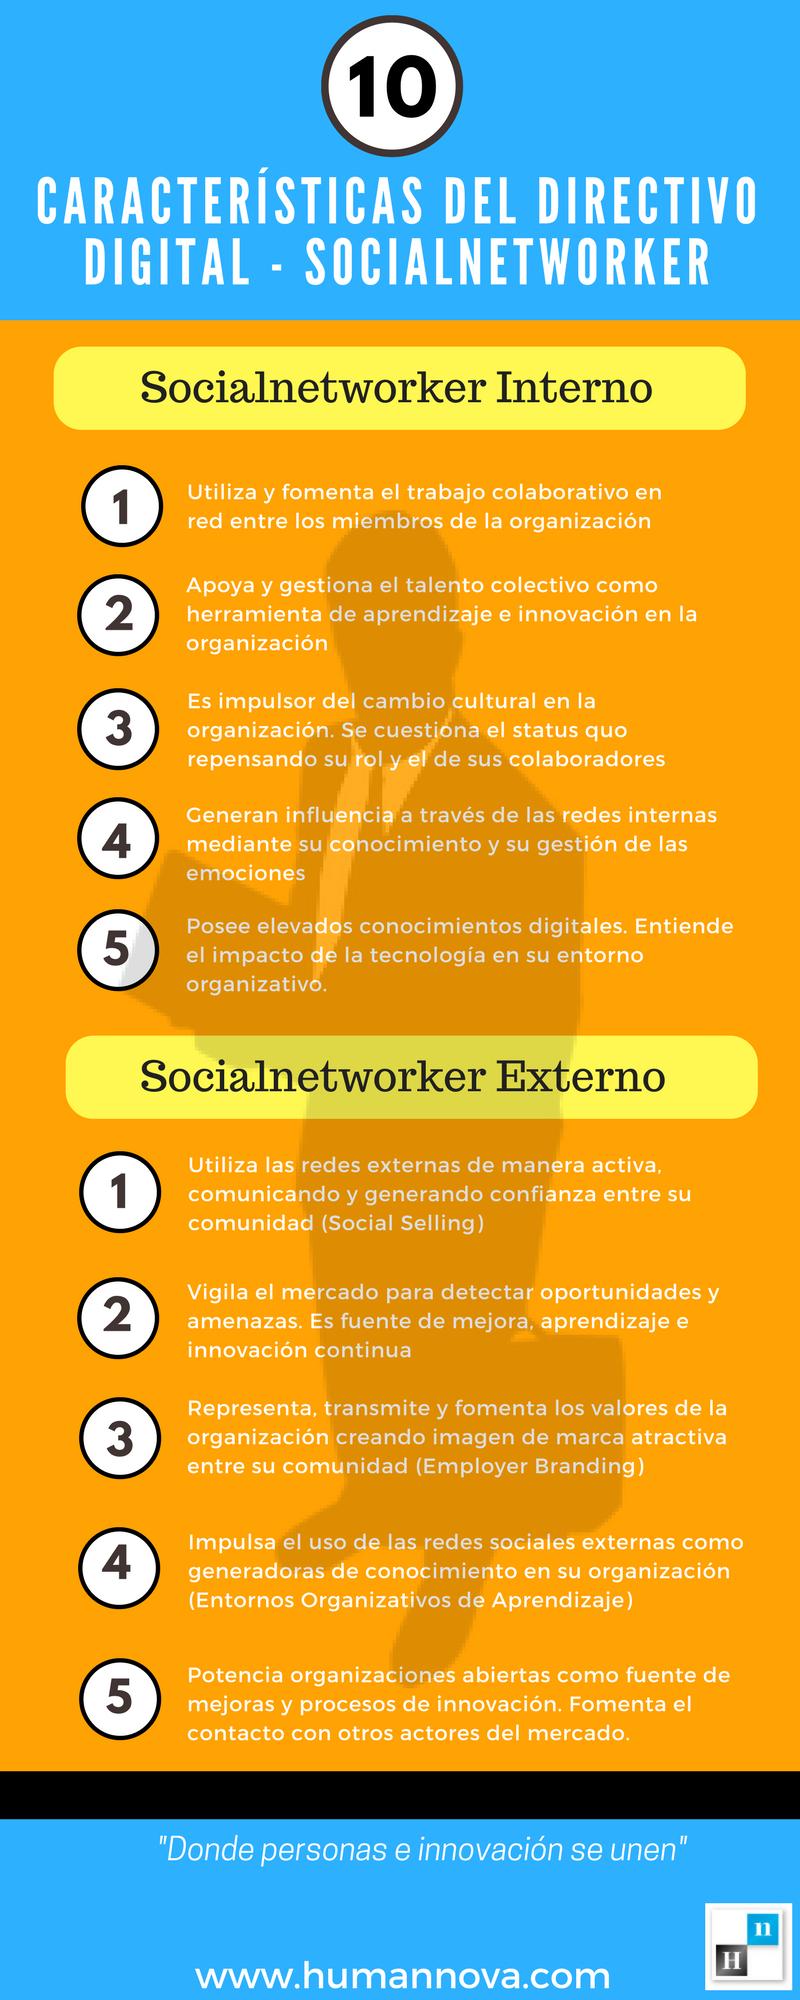 10caracteristicasdirectivodigital socialnetworker